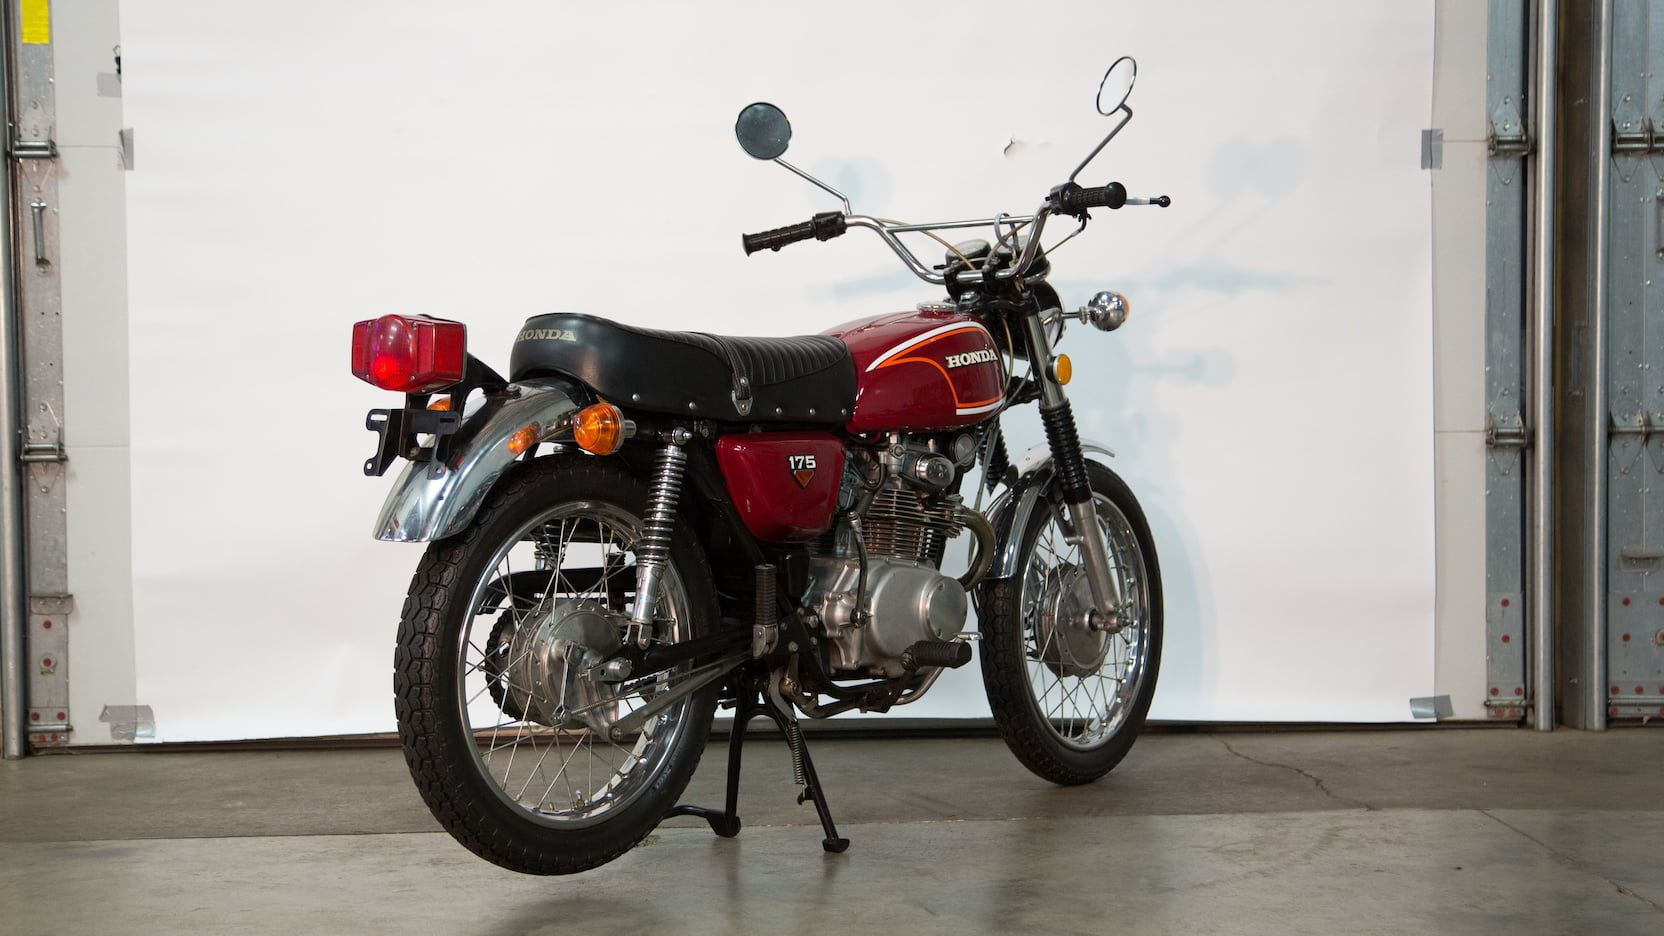 1972 Honda Cl175 Presented As Lot G109 At Las Vegas Nv Honda Mecum Auction Mecum [ 936 x 1664 Pixel ]